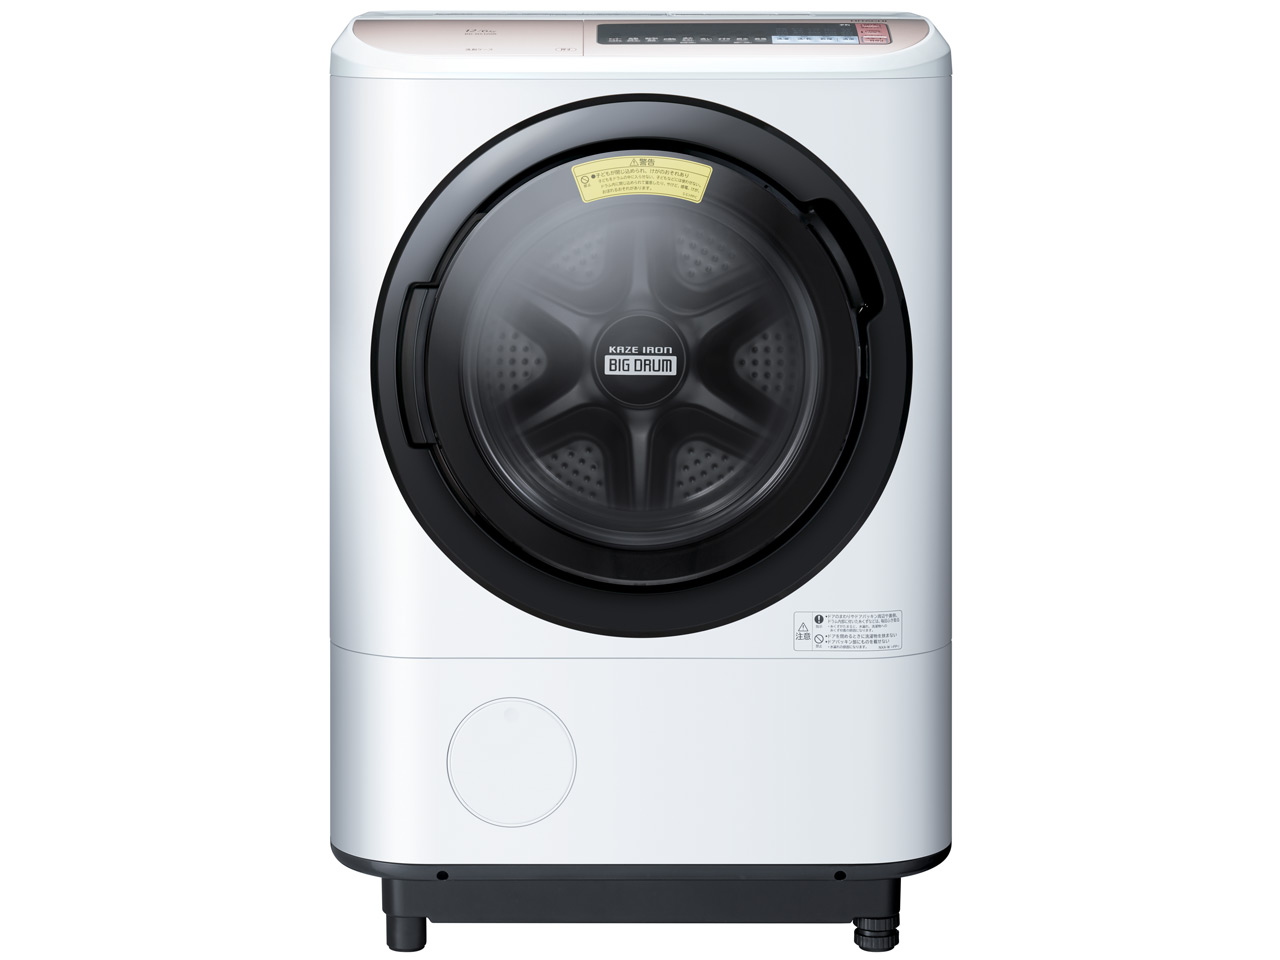 HITACHI 日立【BD-NX120BL-N】BDNX120BL-N 左開き] ドラム式洗濯乾燥機 (洗濯12.0kg/乾燥6.0kg)「ヒートリサイクル 風アイロン ビッグドラム」 【洗濯槽自動お掃除・ヒーター乾燥機能付】シャンパン【KK9N0D18P】